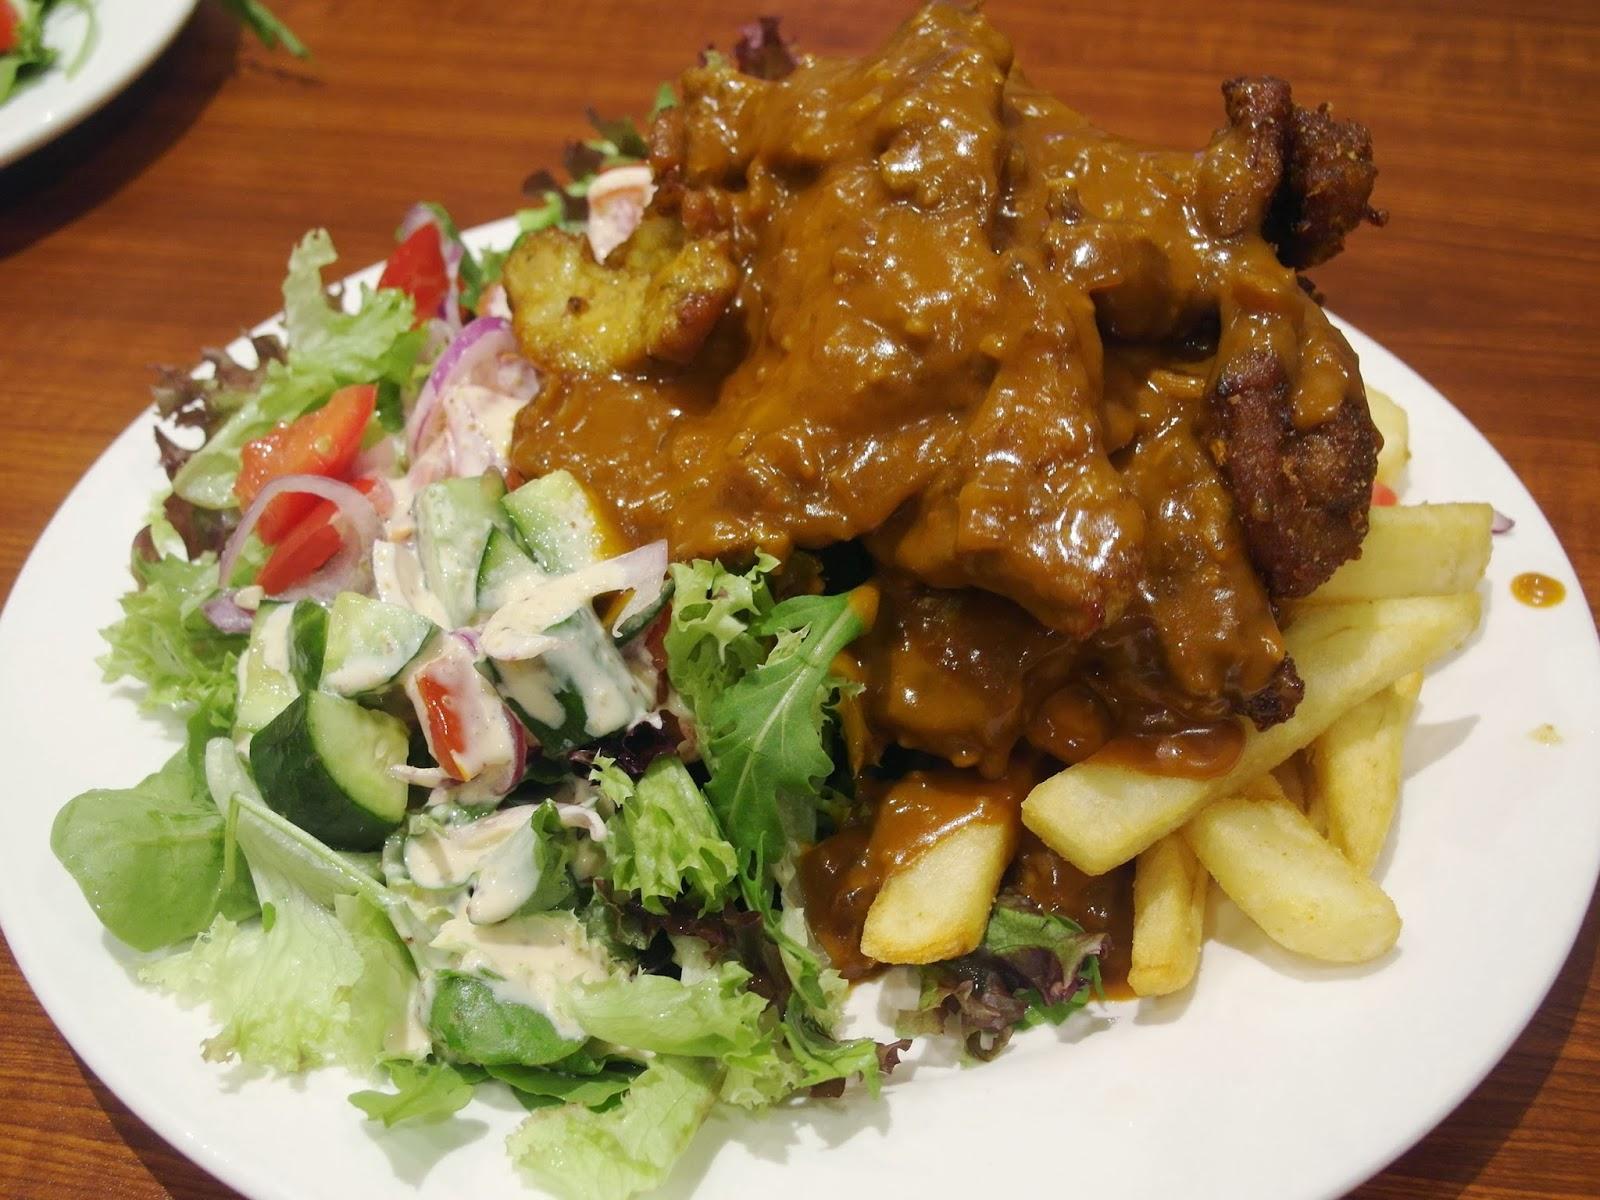 Pork chop in dianne sauce 10 00